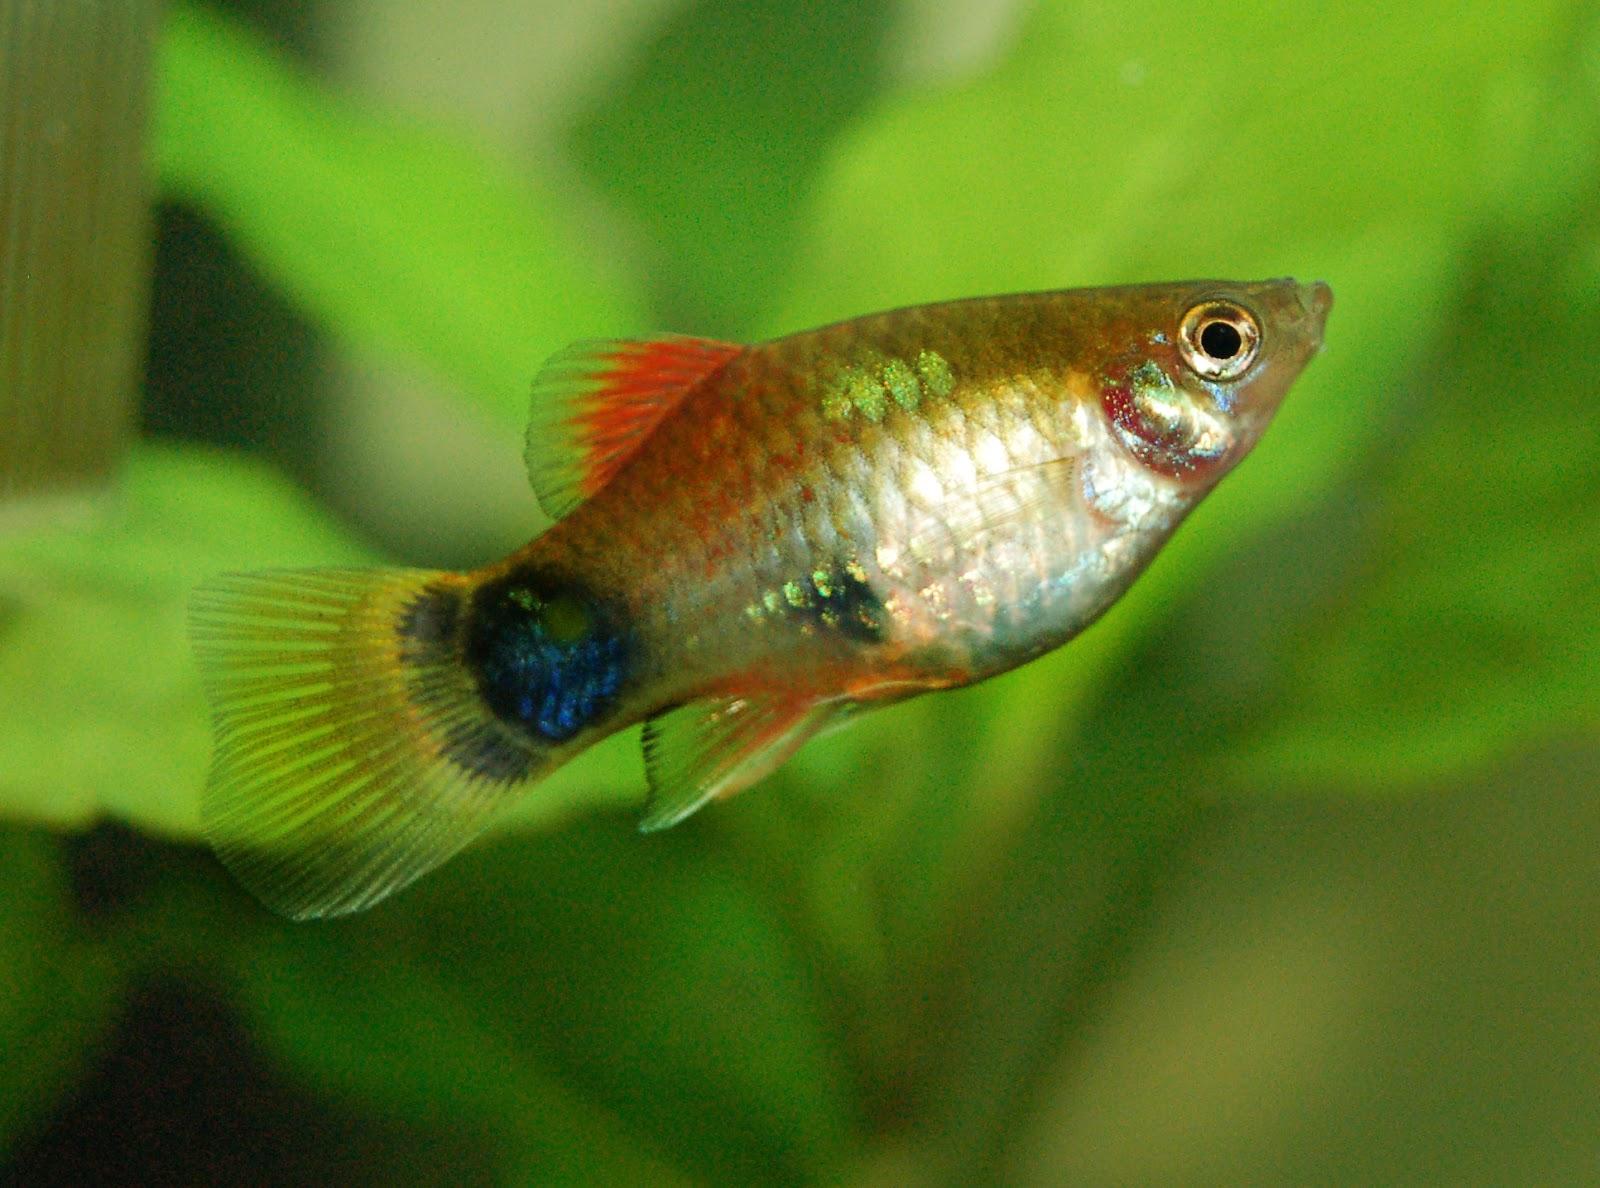 Mickey Mouse Platy Fish - Fish Habitat And Ecology